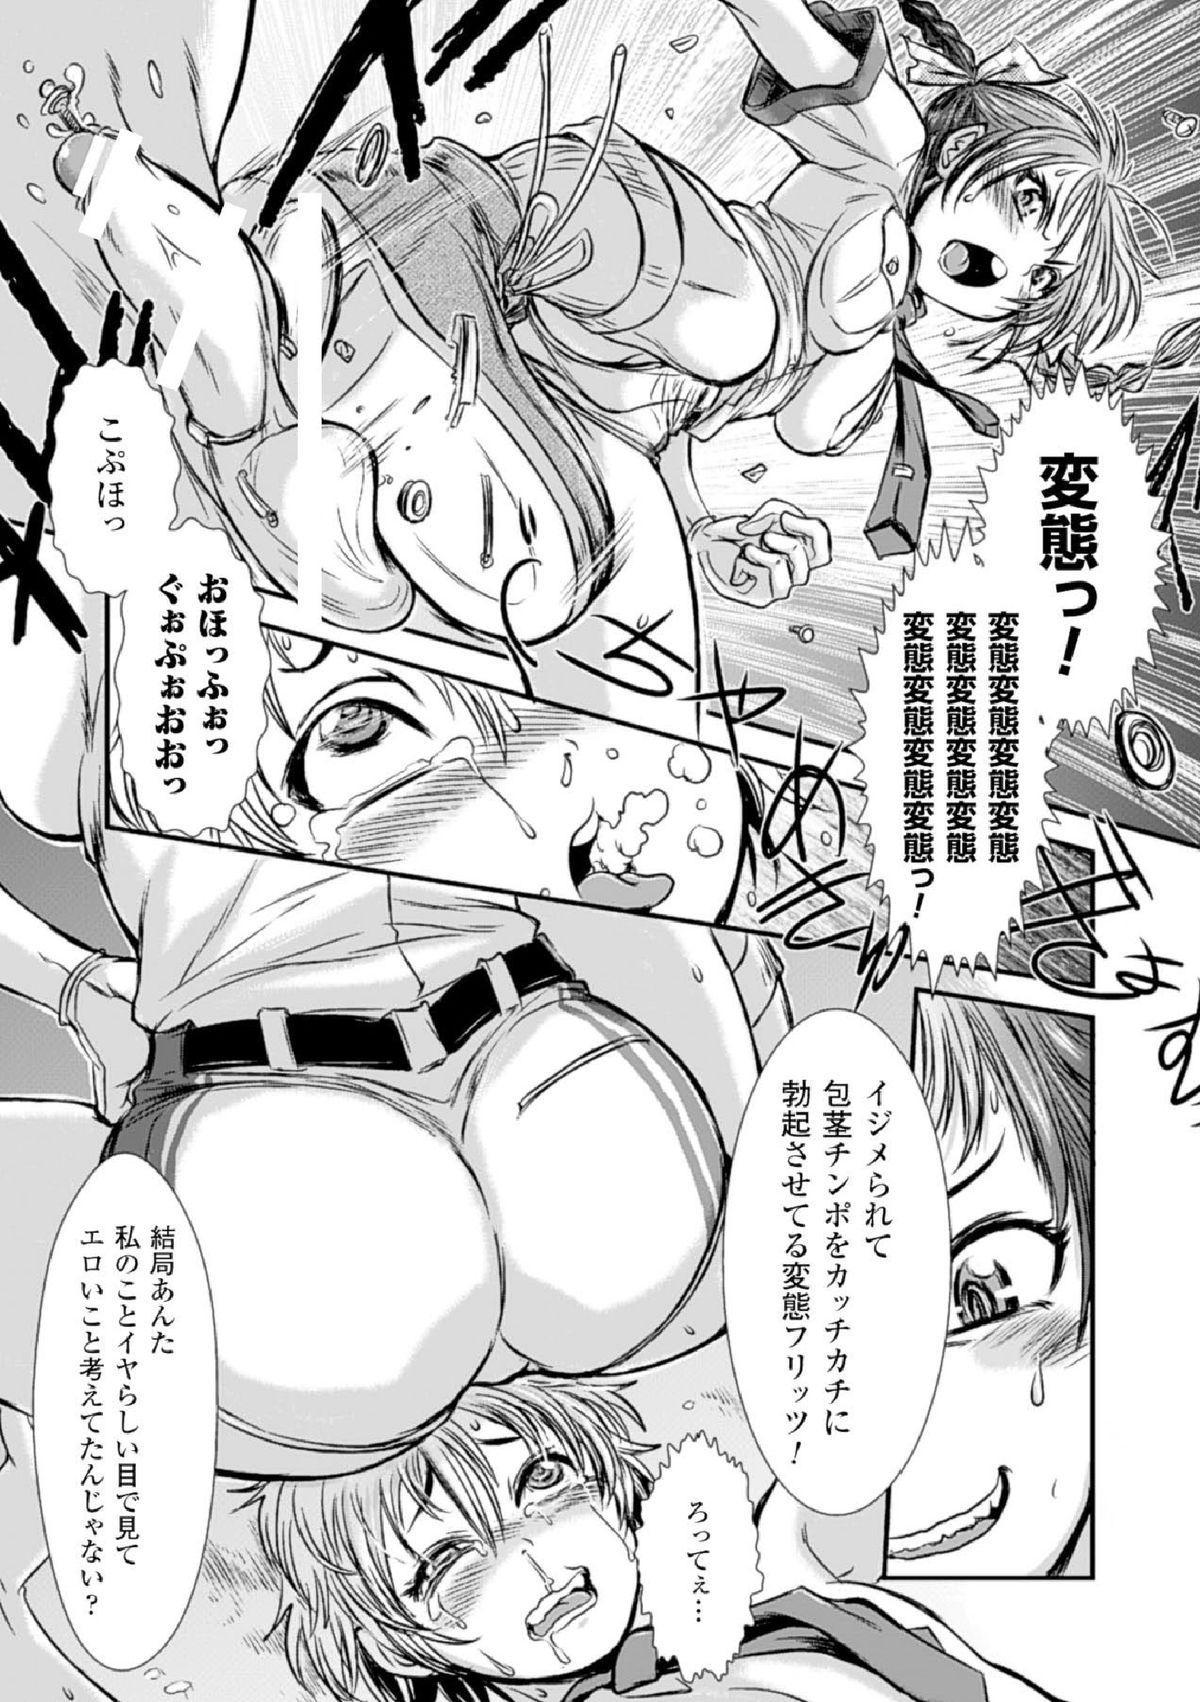 Haiboku Heroine Kaizou Choukyou Inferno 170